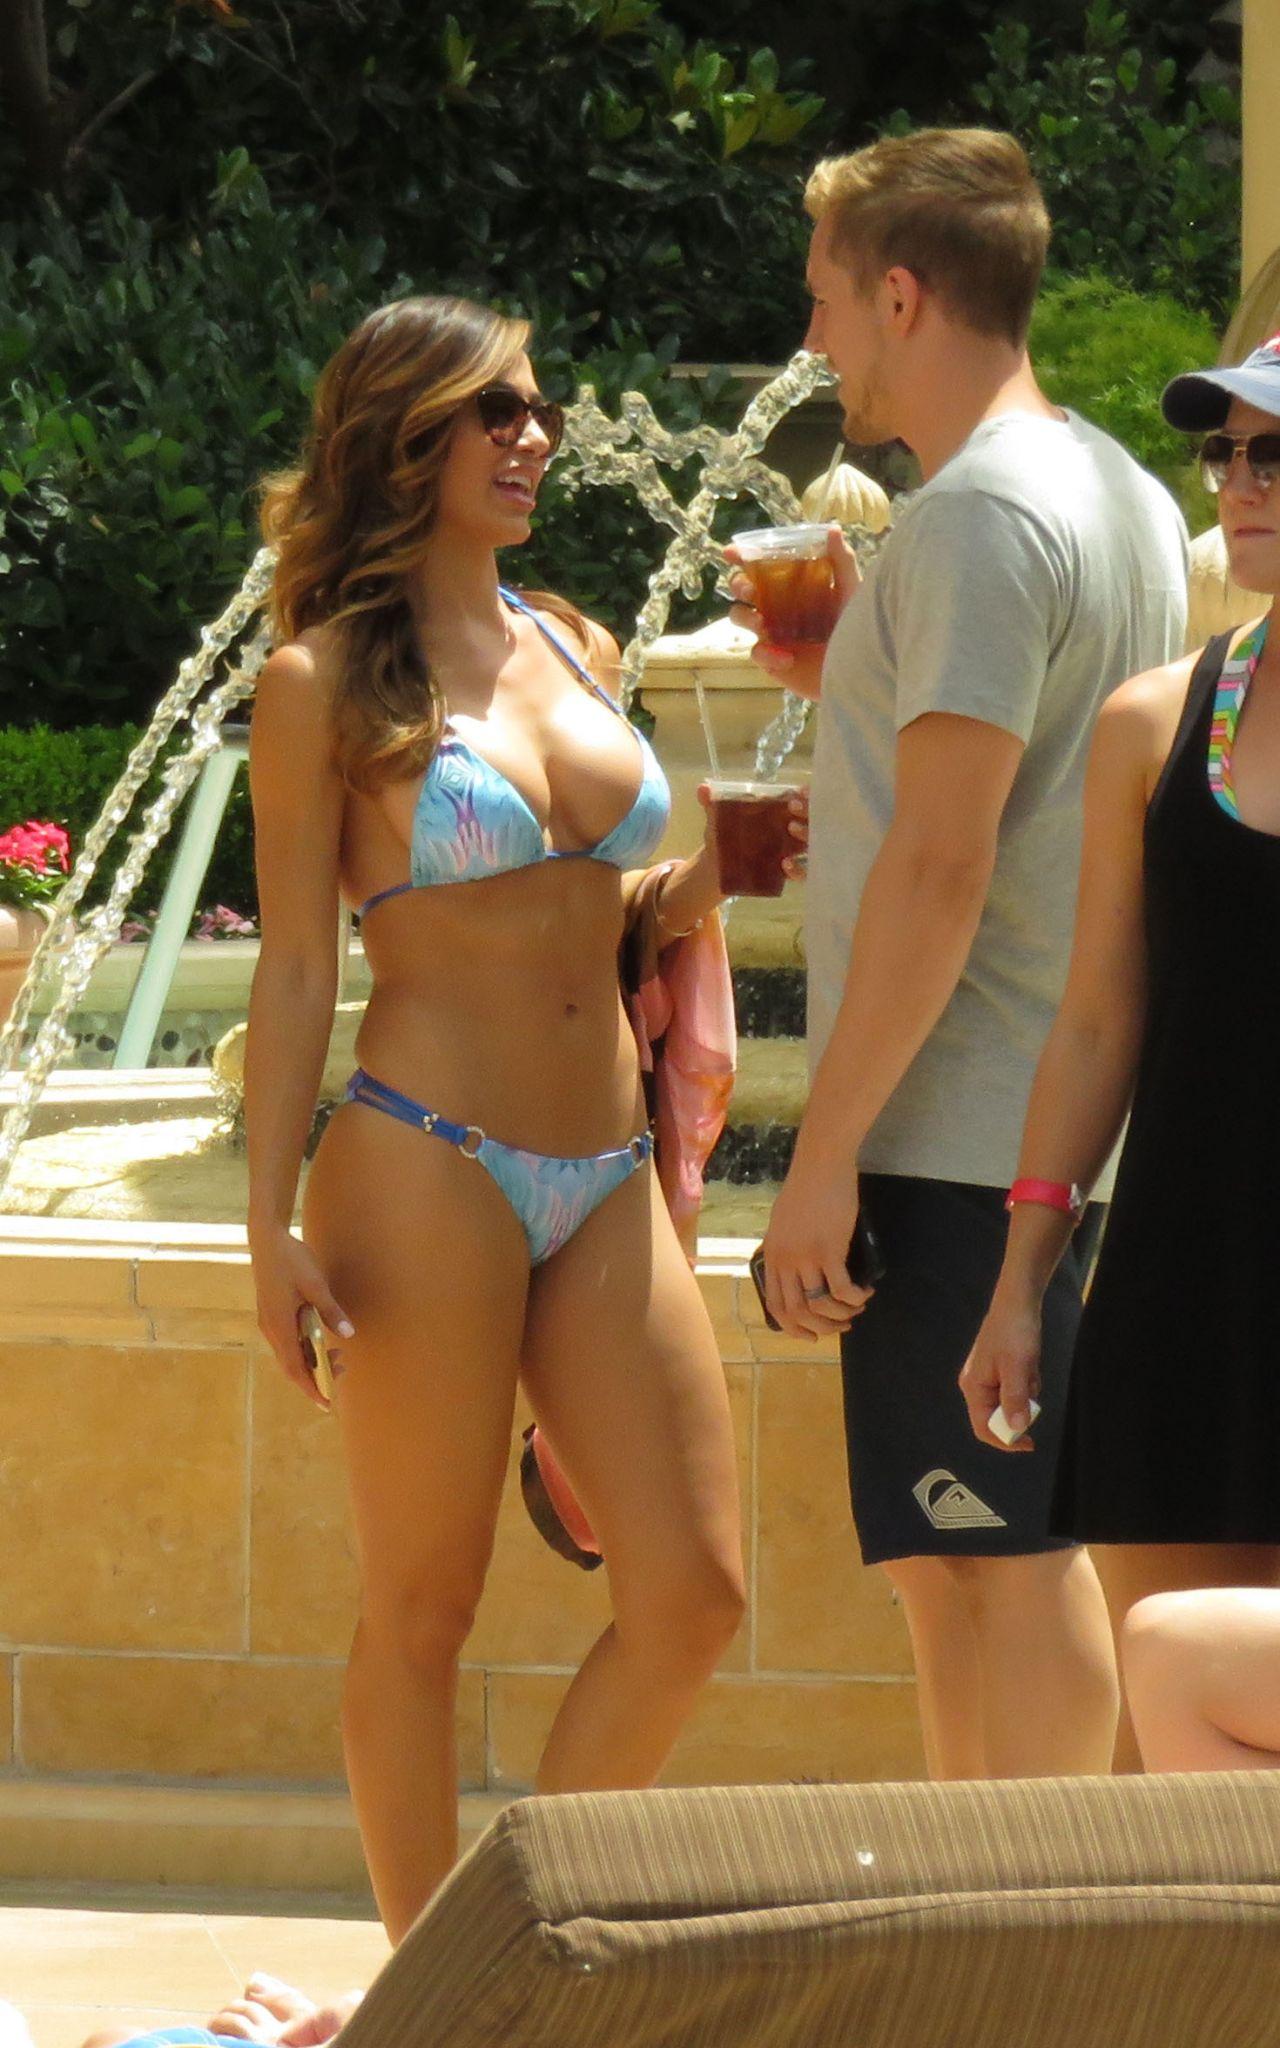 Ana cheri bikini pics shows off her curves in las vegas for Pool show vegas 2015